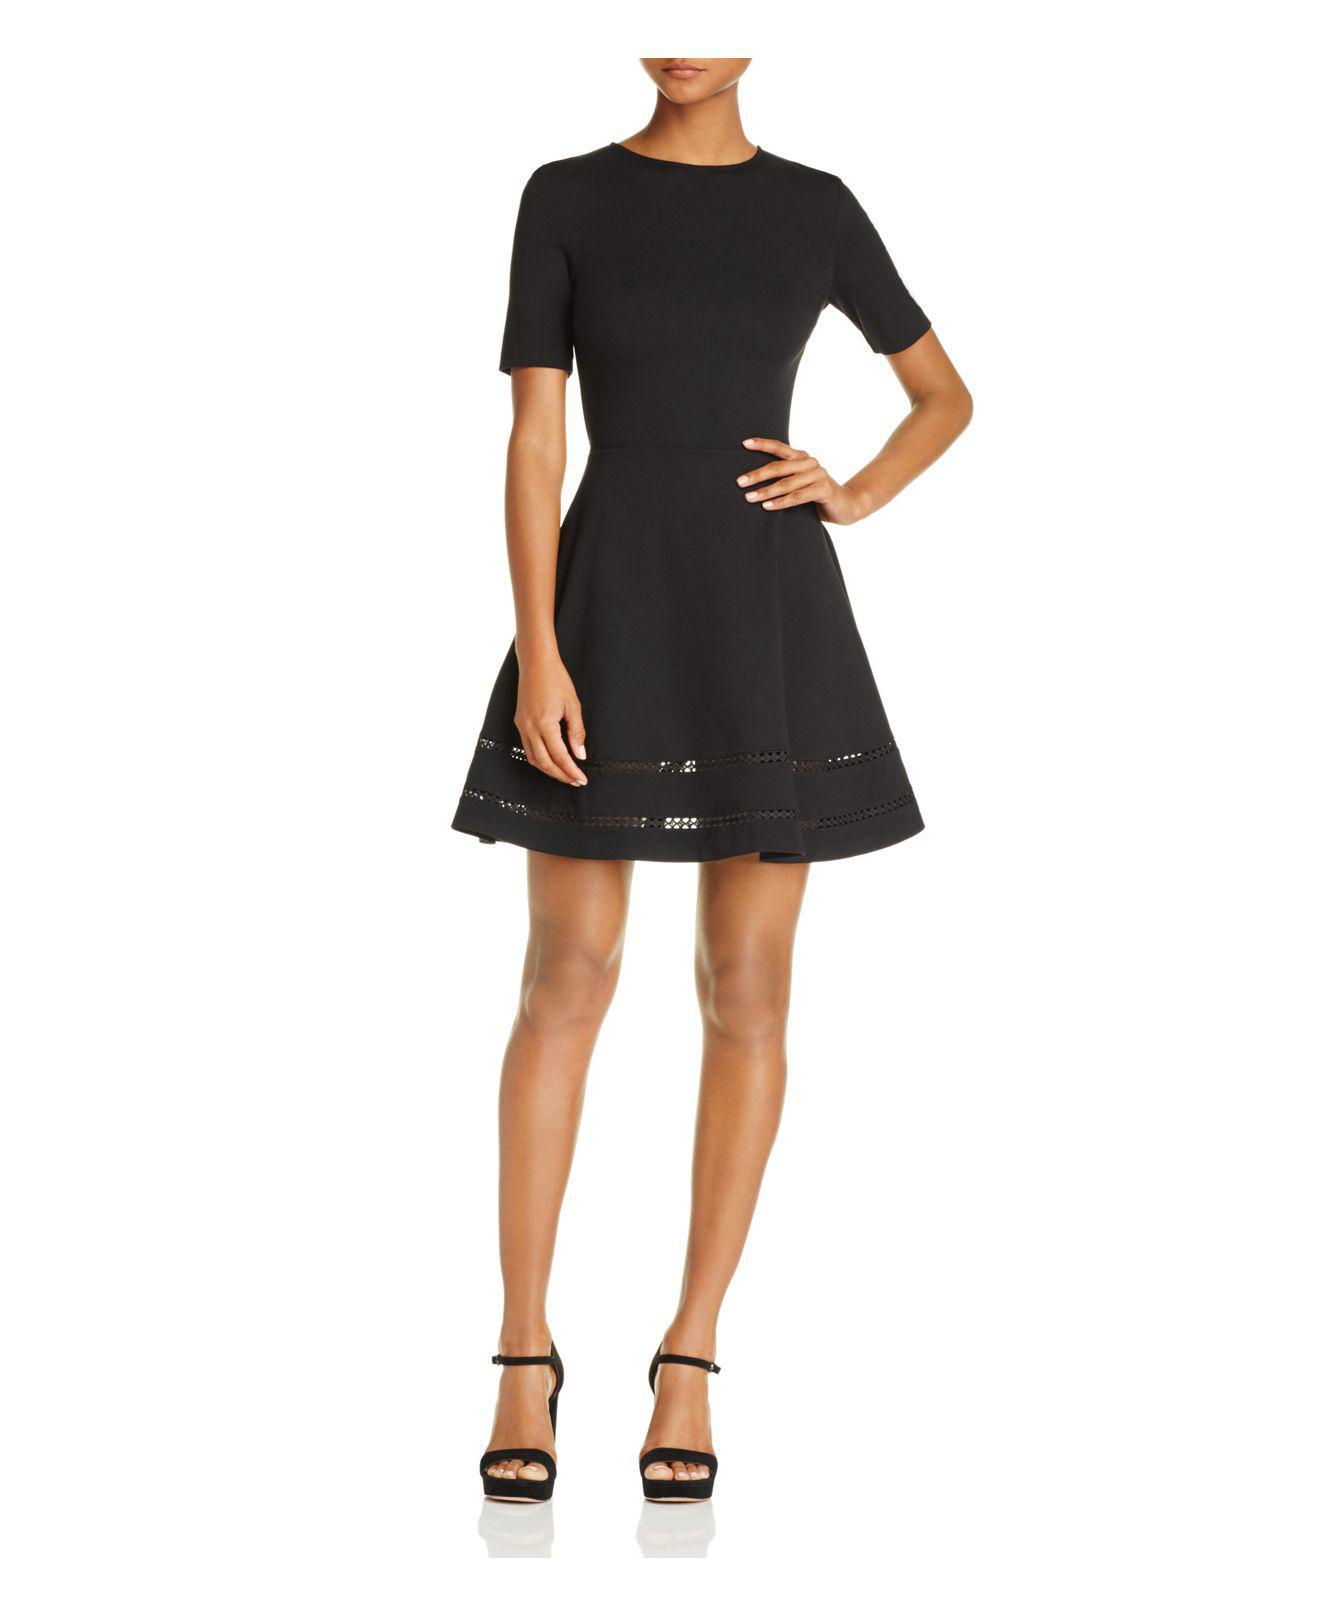 Aqua Crochet Inset Fit And Flare Dress In Black Lyst